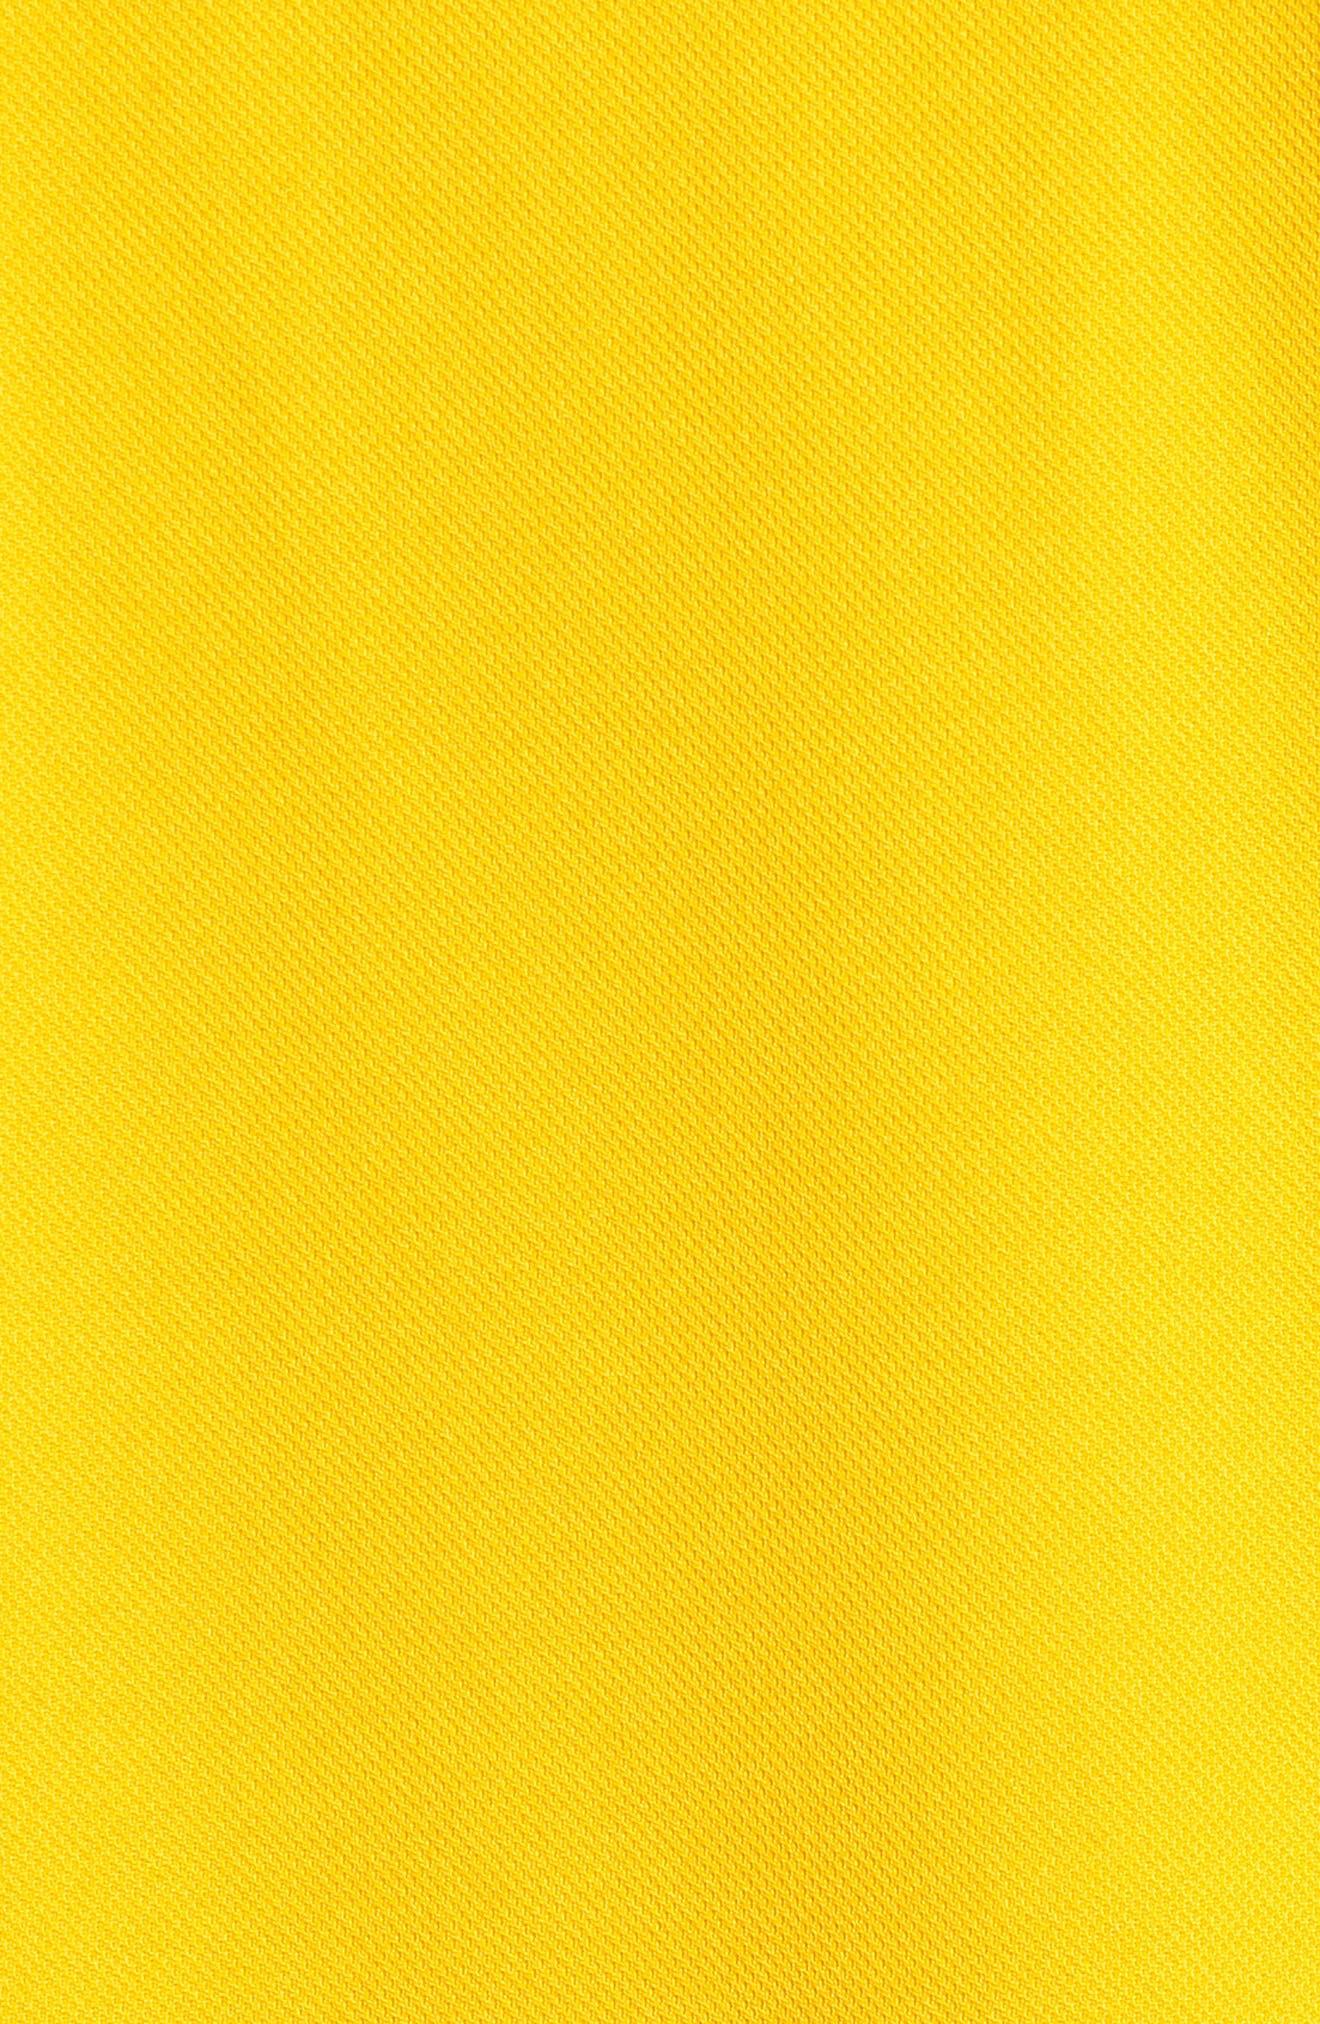 Sport Piped Piqué Tech Polo,                             Alternate thumbnail 5, color,                             Buttercup/ Navy Blue